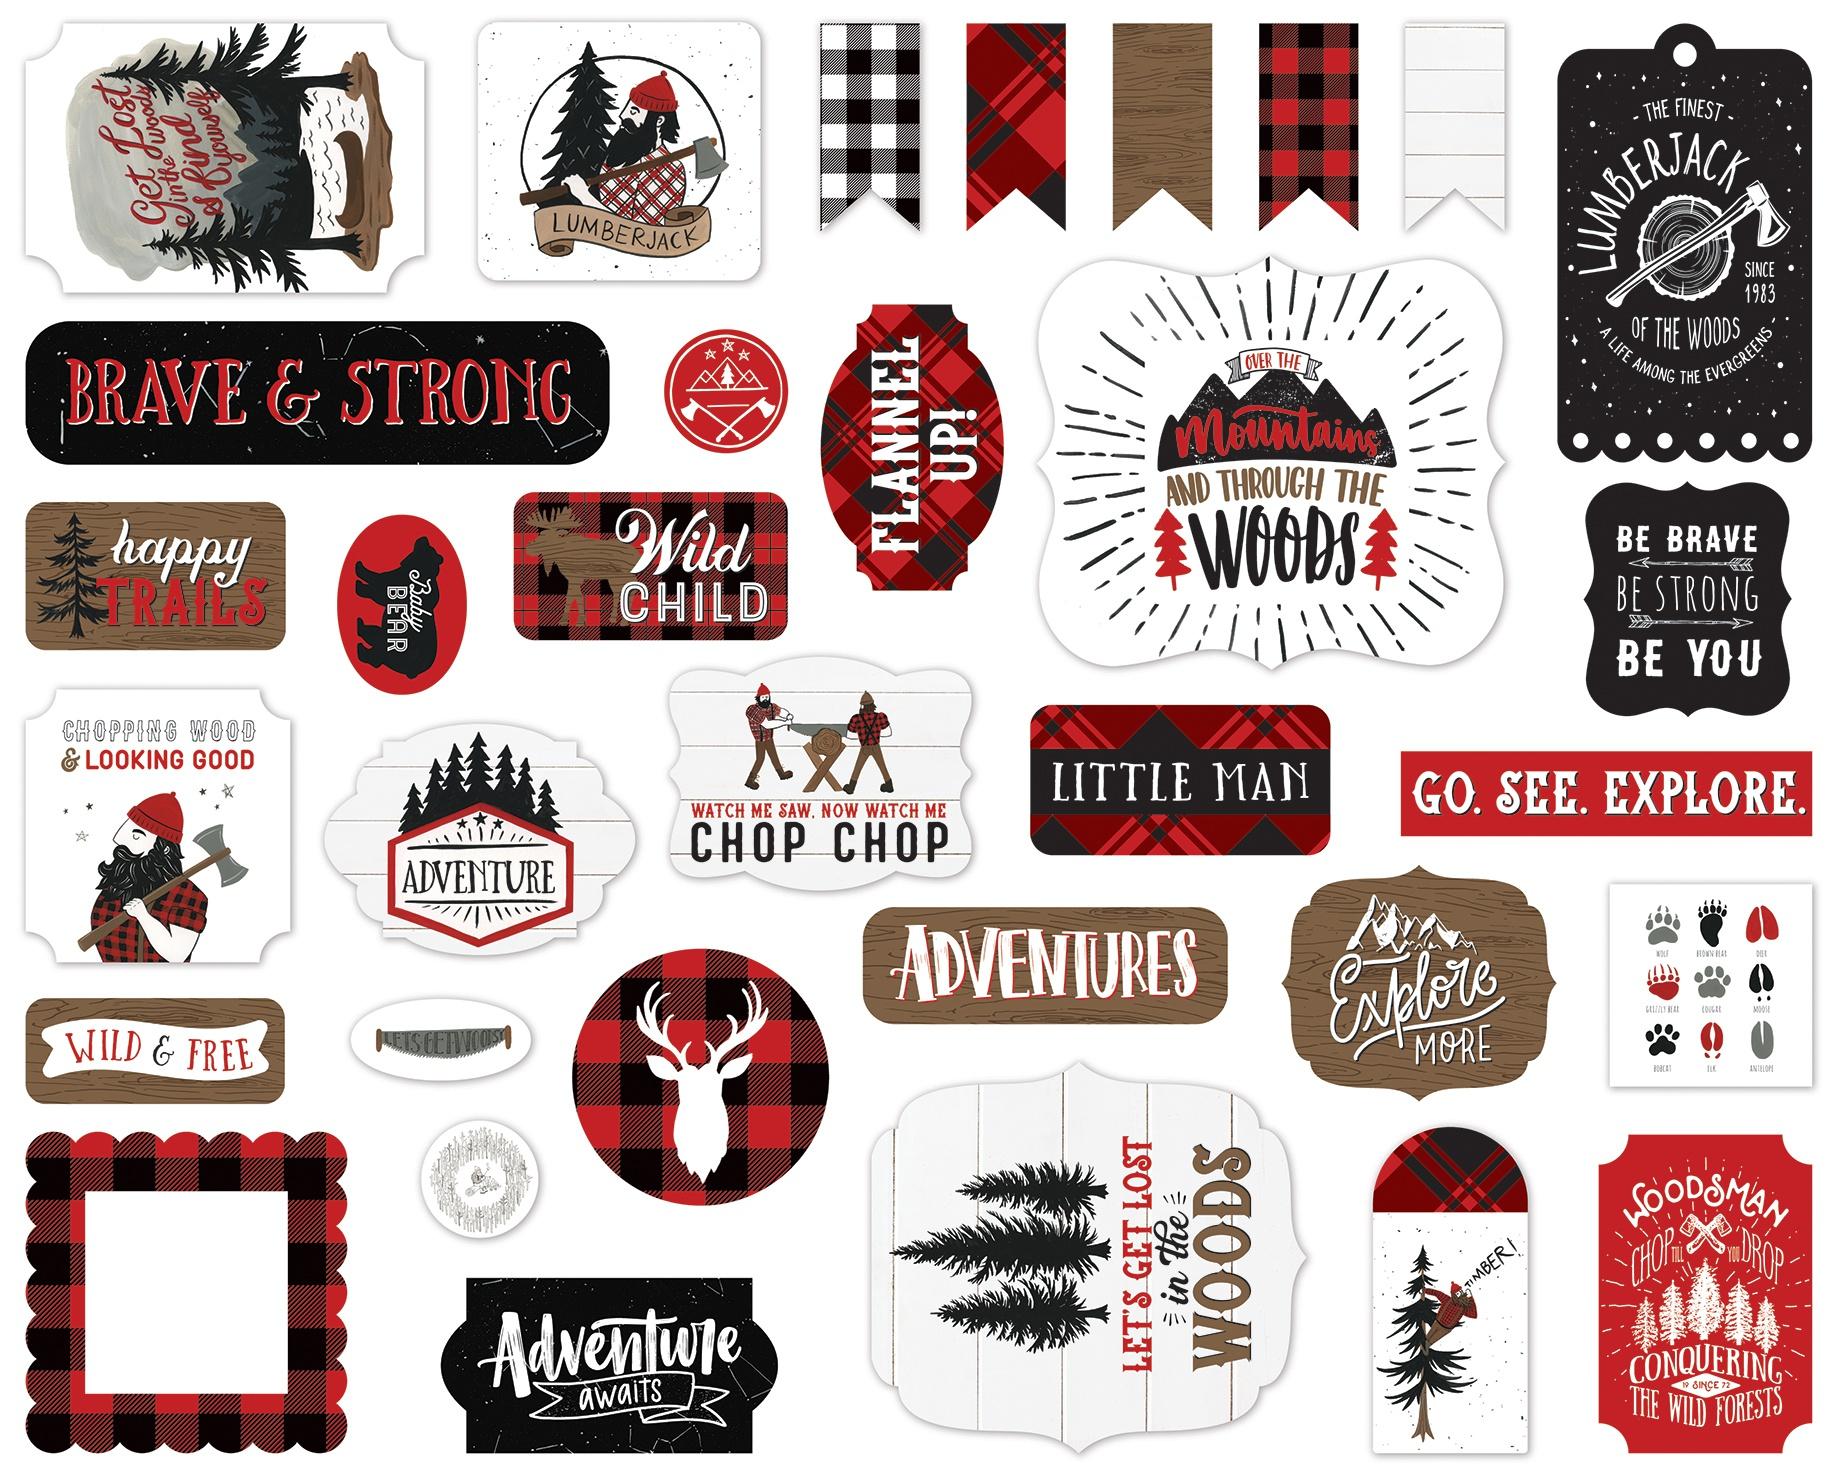 Echo Park Cardstock Ephemera 33/Pkg-Icons, Let's Lumberjack